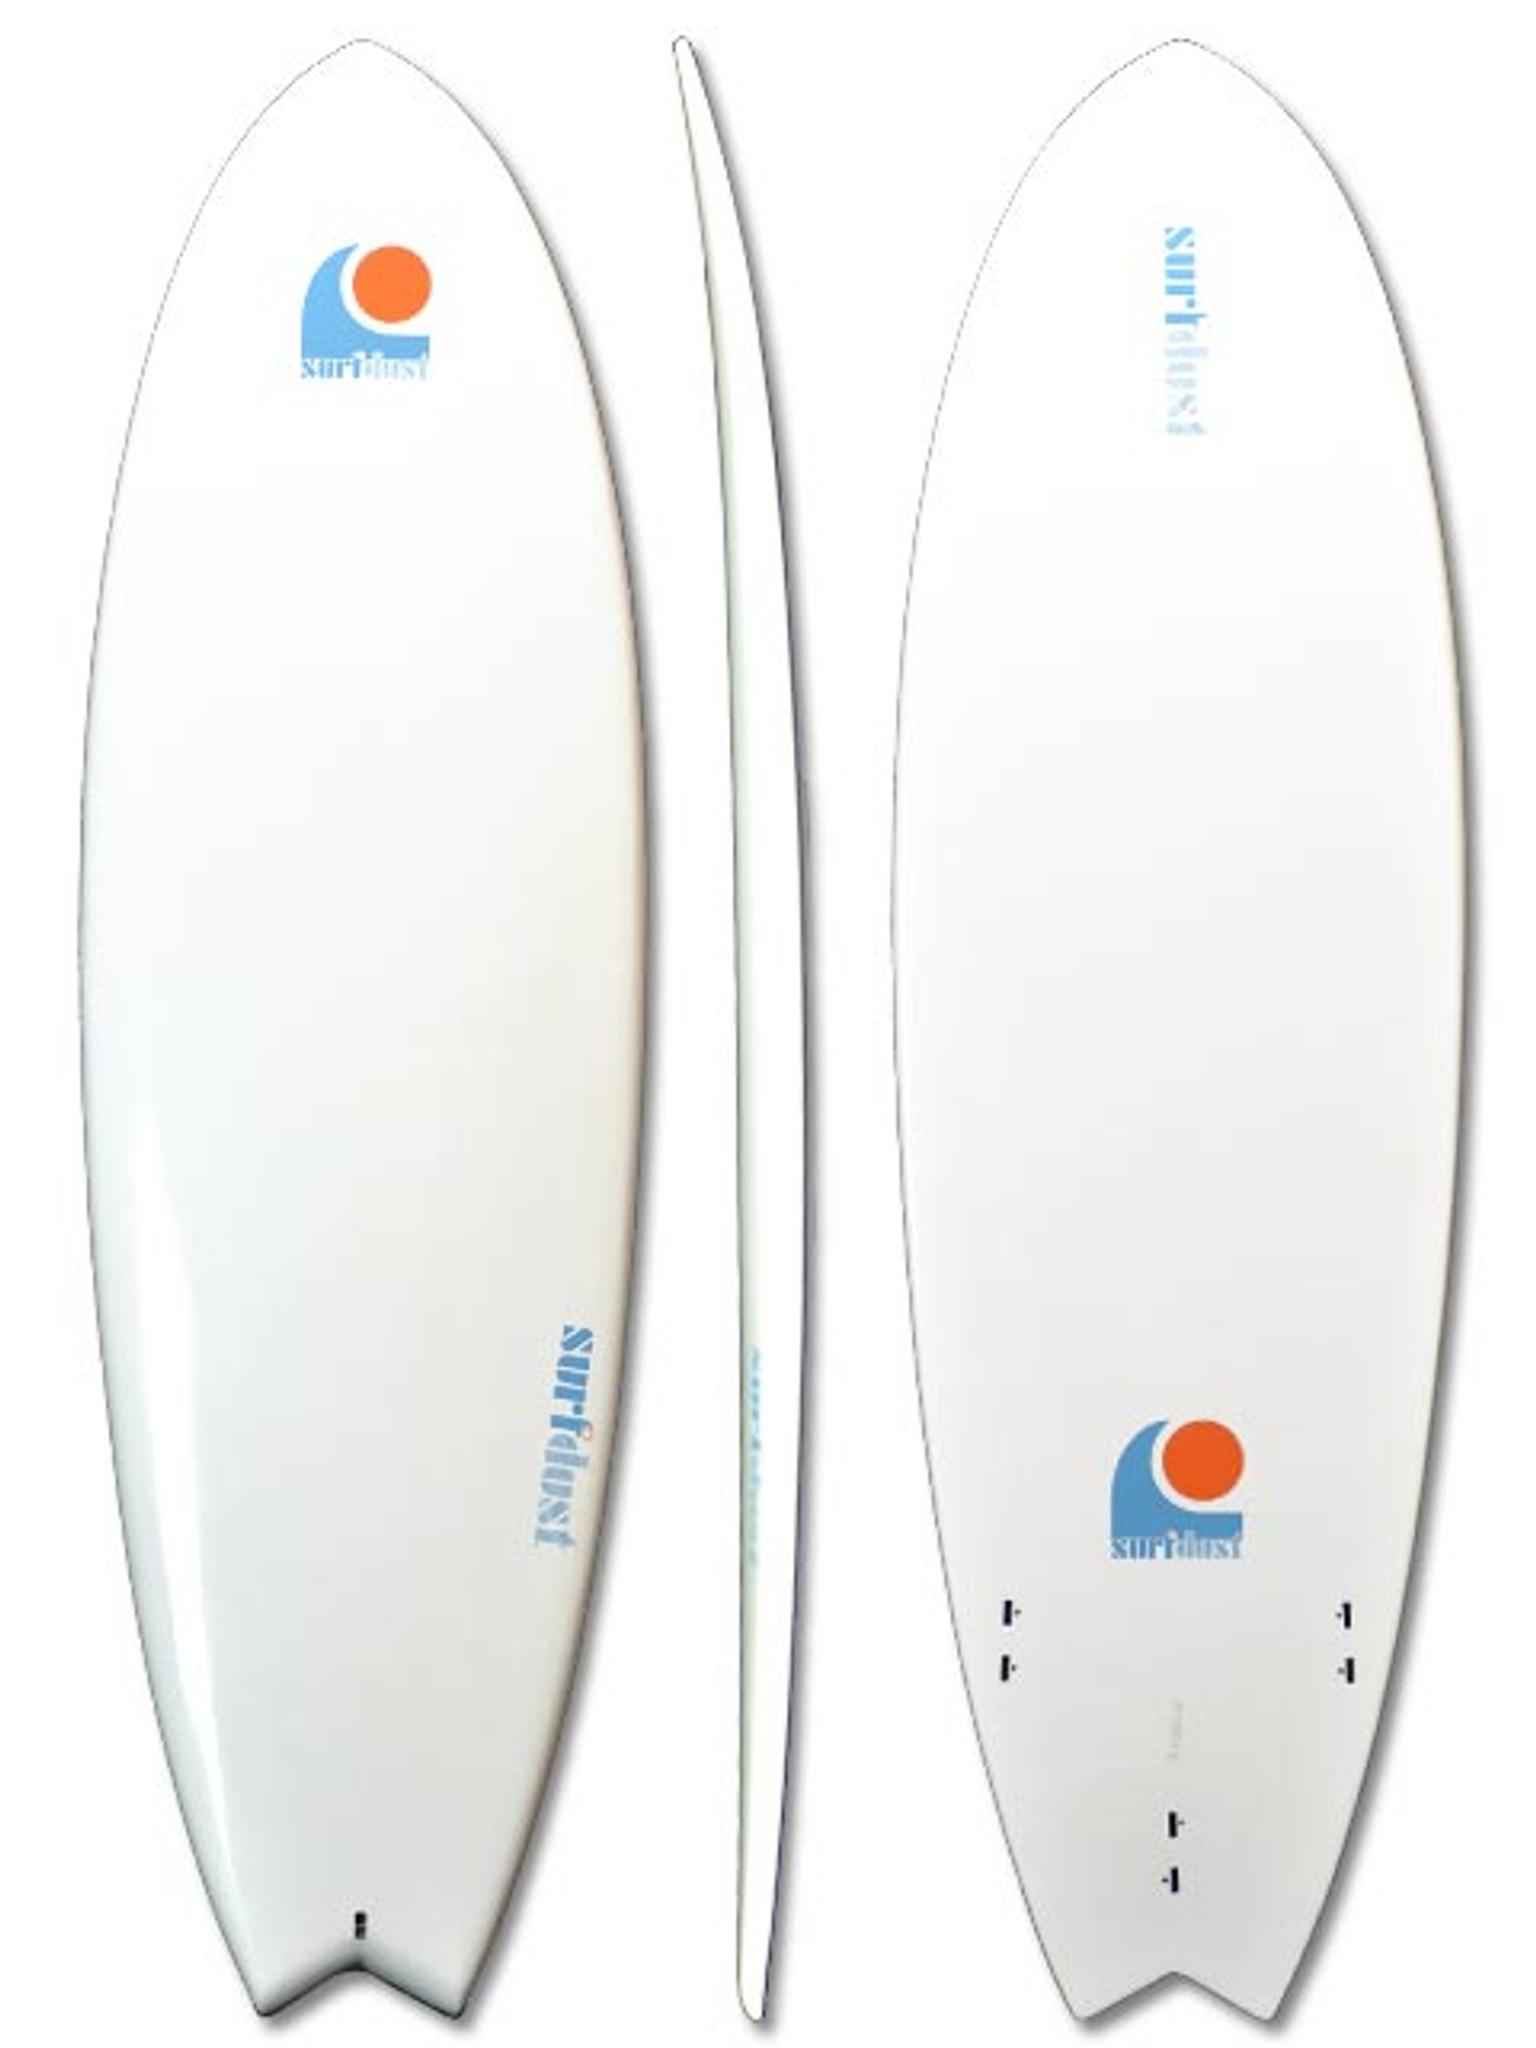 URFDUST - 6.4ft Fish - Mini-Mal Epoxy Surfboard - Surfing